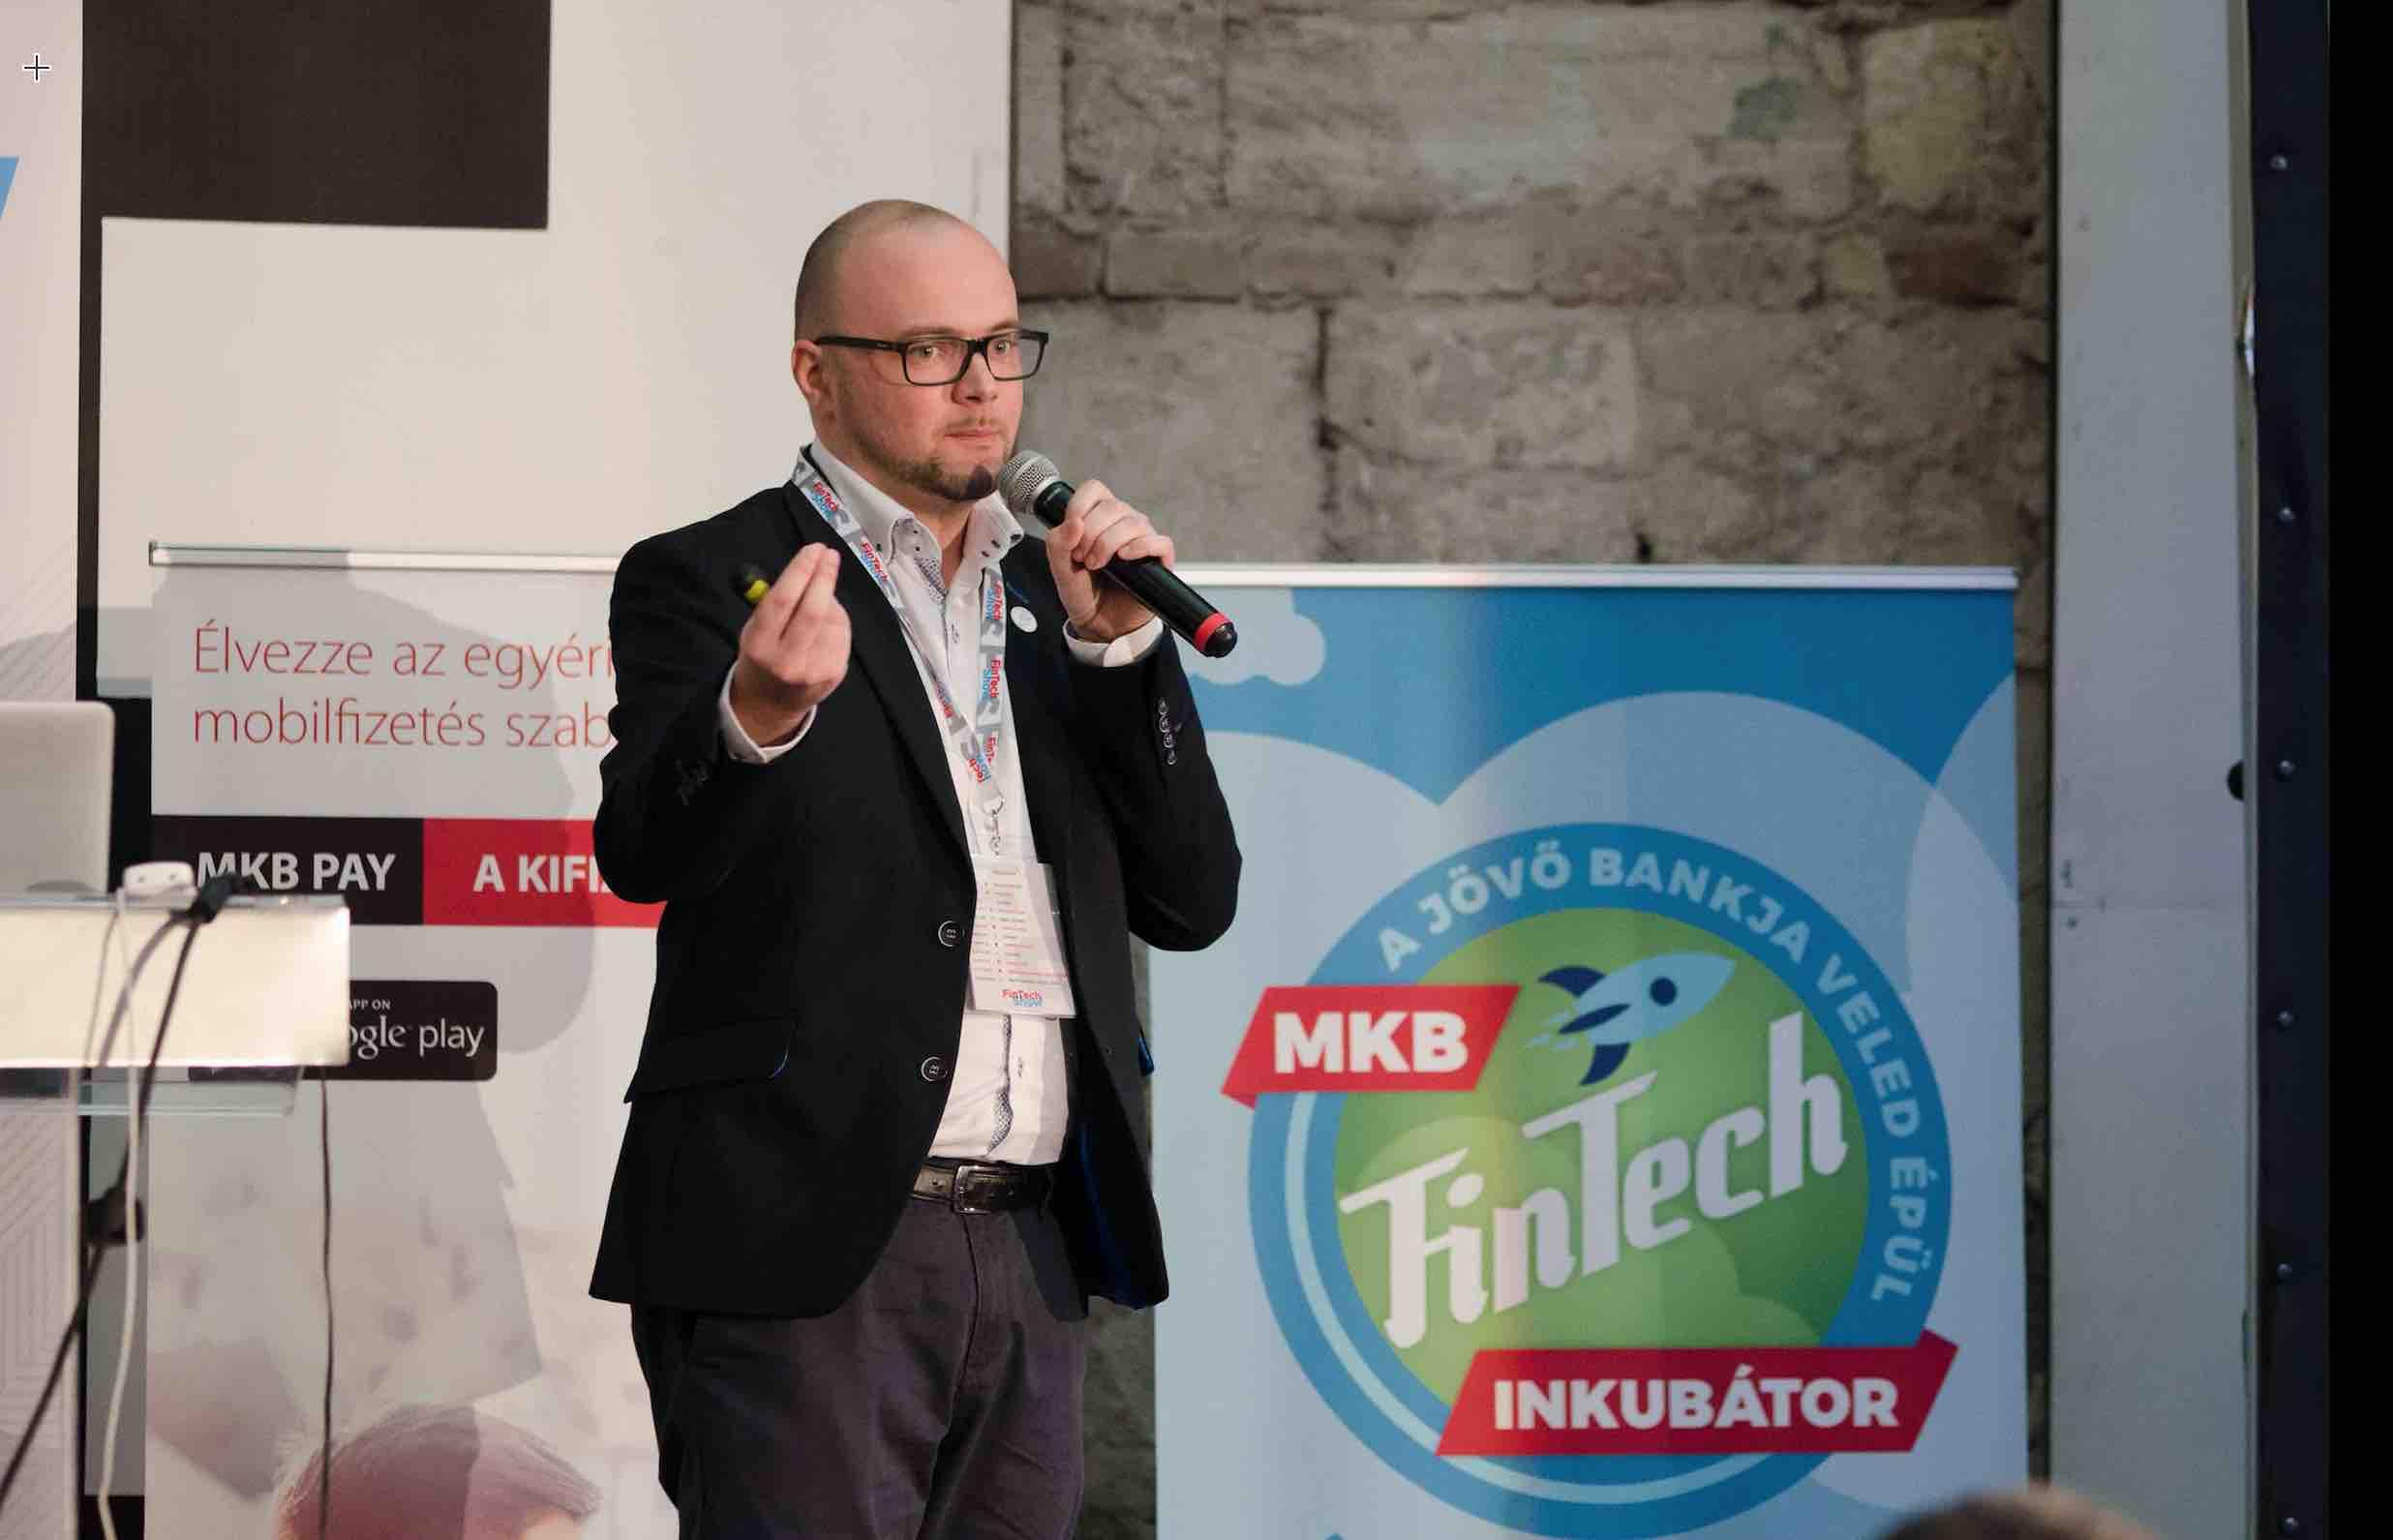 Kriph.io a FinTechShow 2017 gyoztes